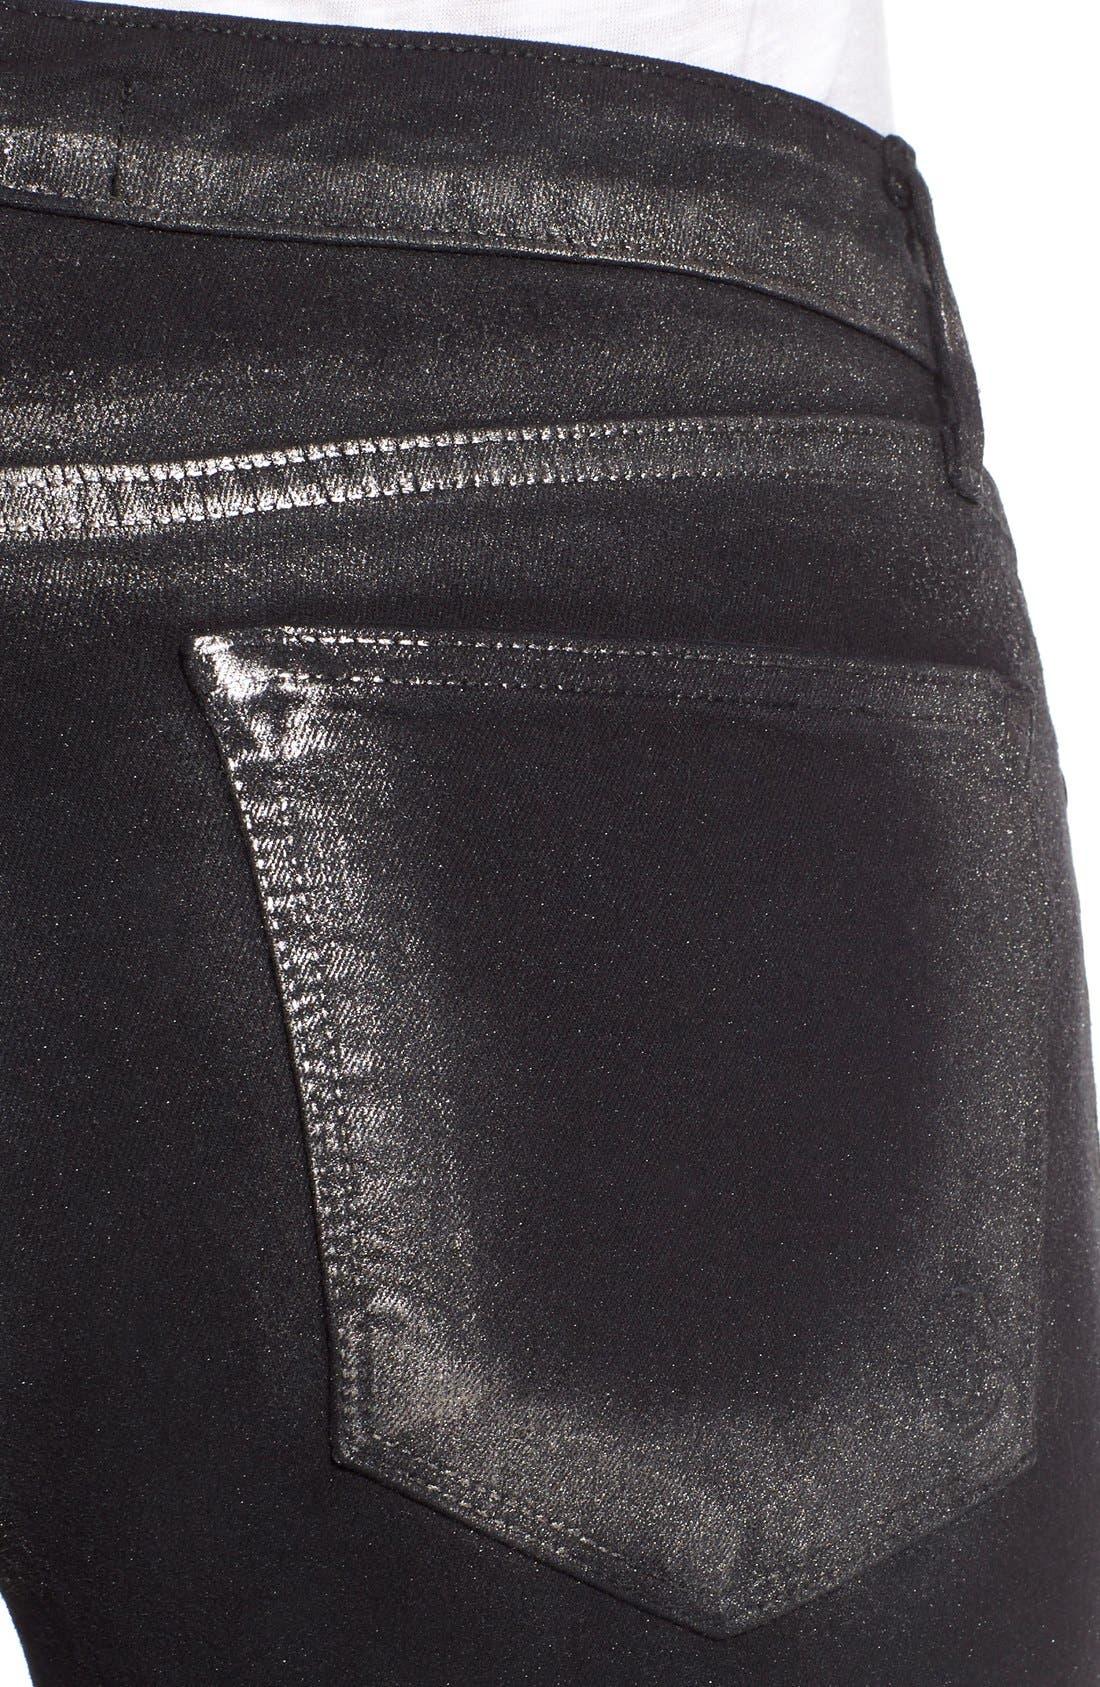 Alternate Image 4  - CJ by Cookie Johnson 'Wisdom' Brushed Foil Skinny Jeans (Pewter)